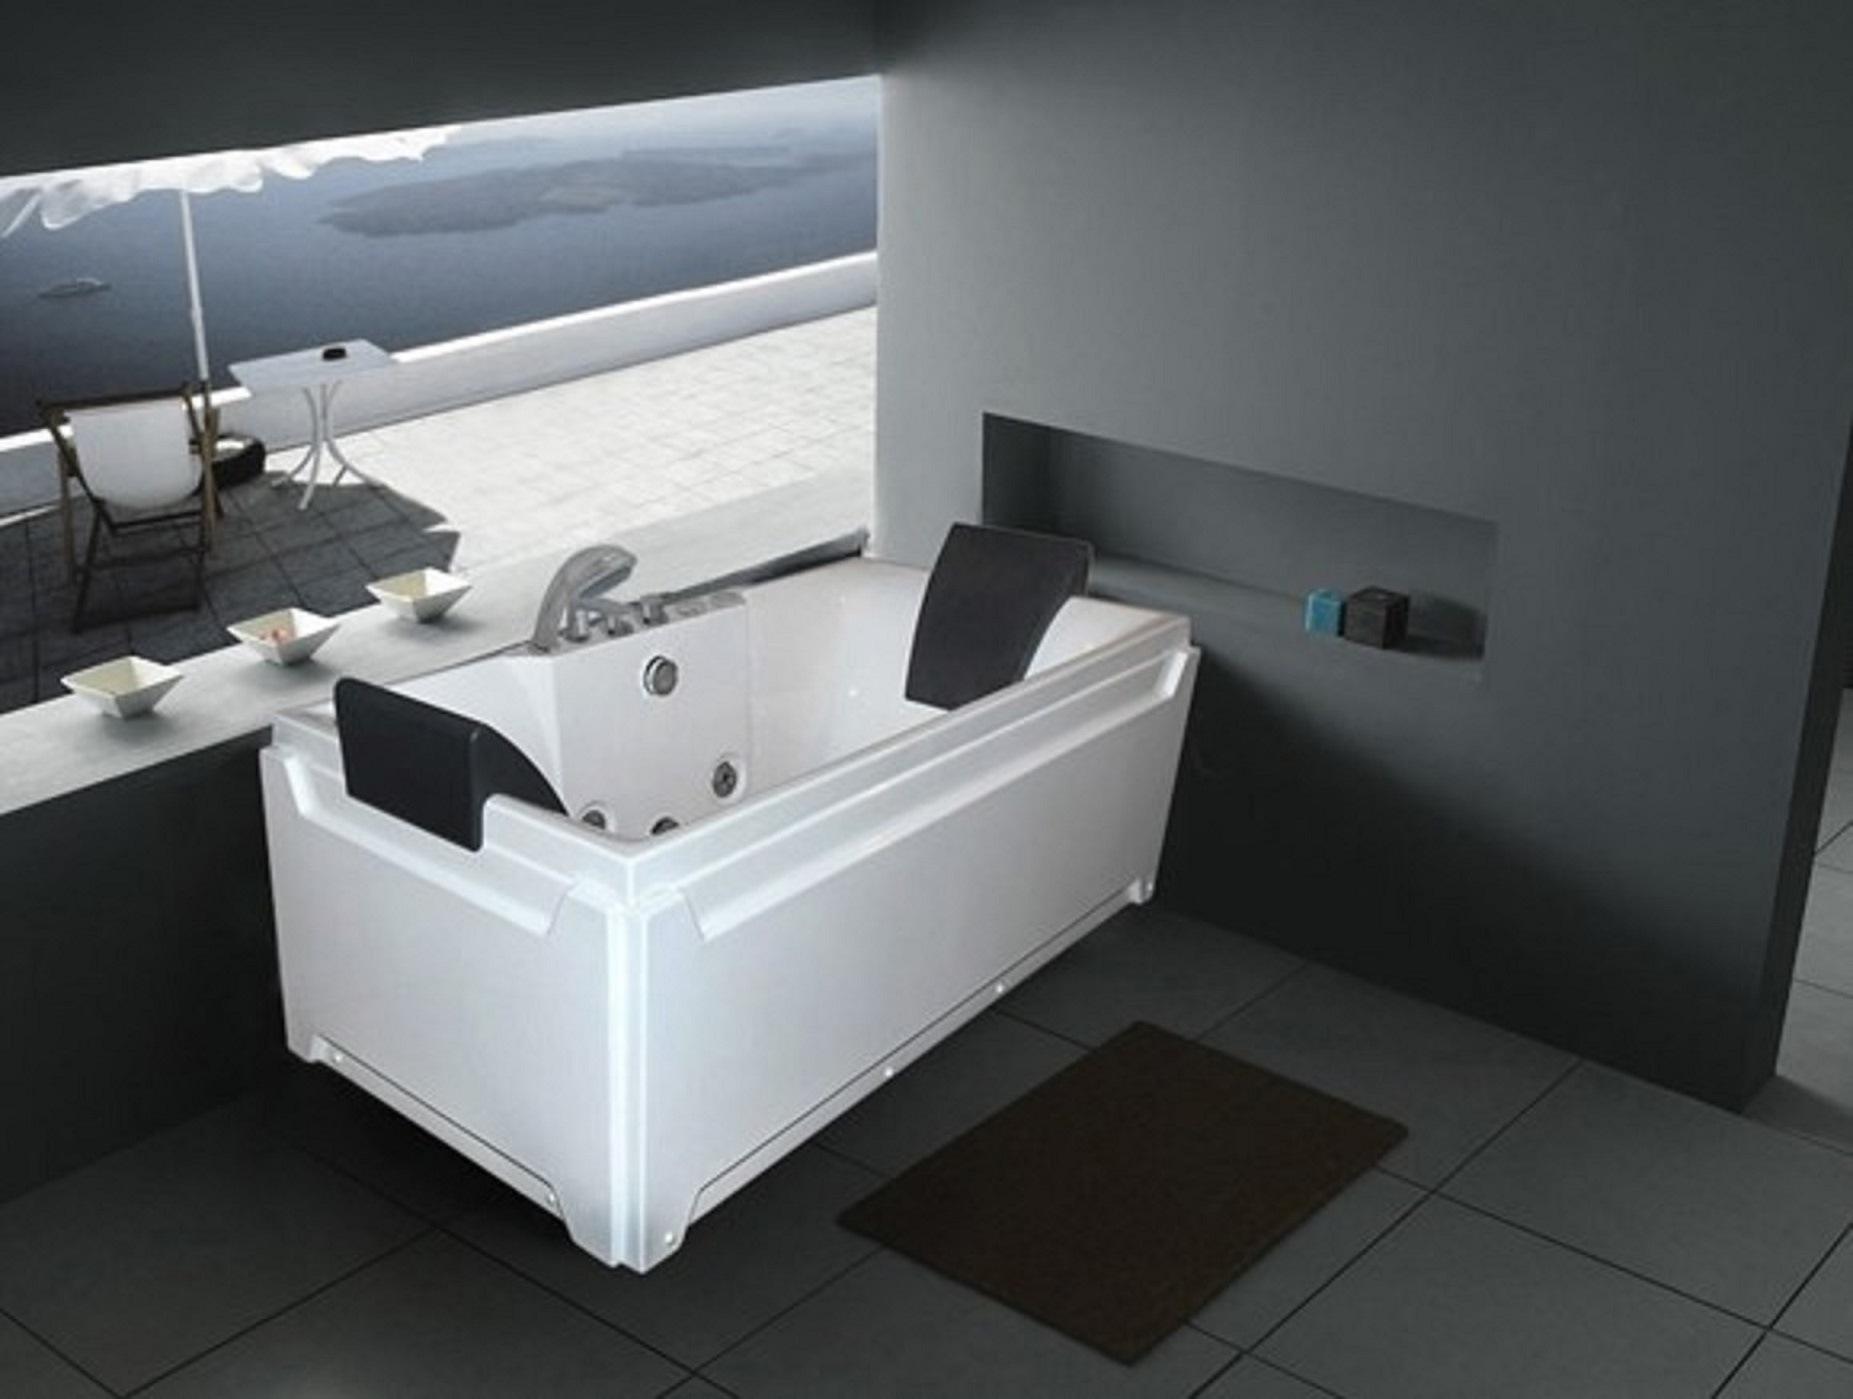 China Monalisa Bathroom Acrylic Hot Tub Whirlpool Massage Pool M ...